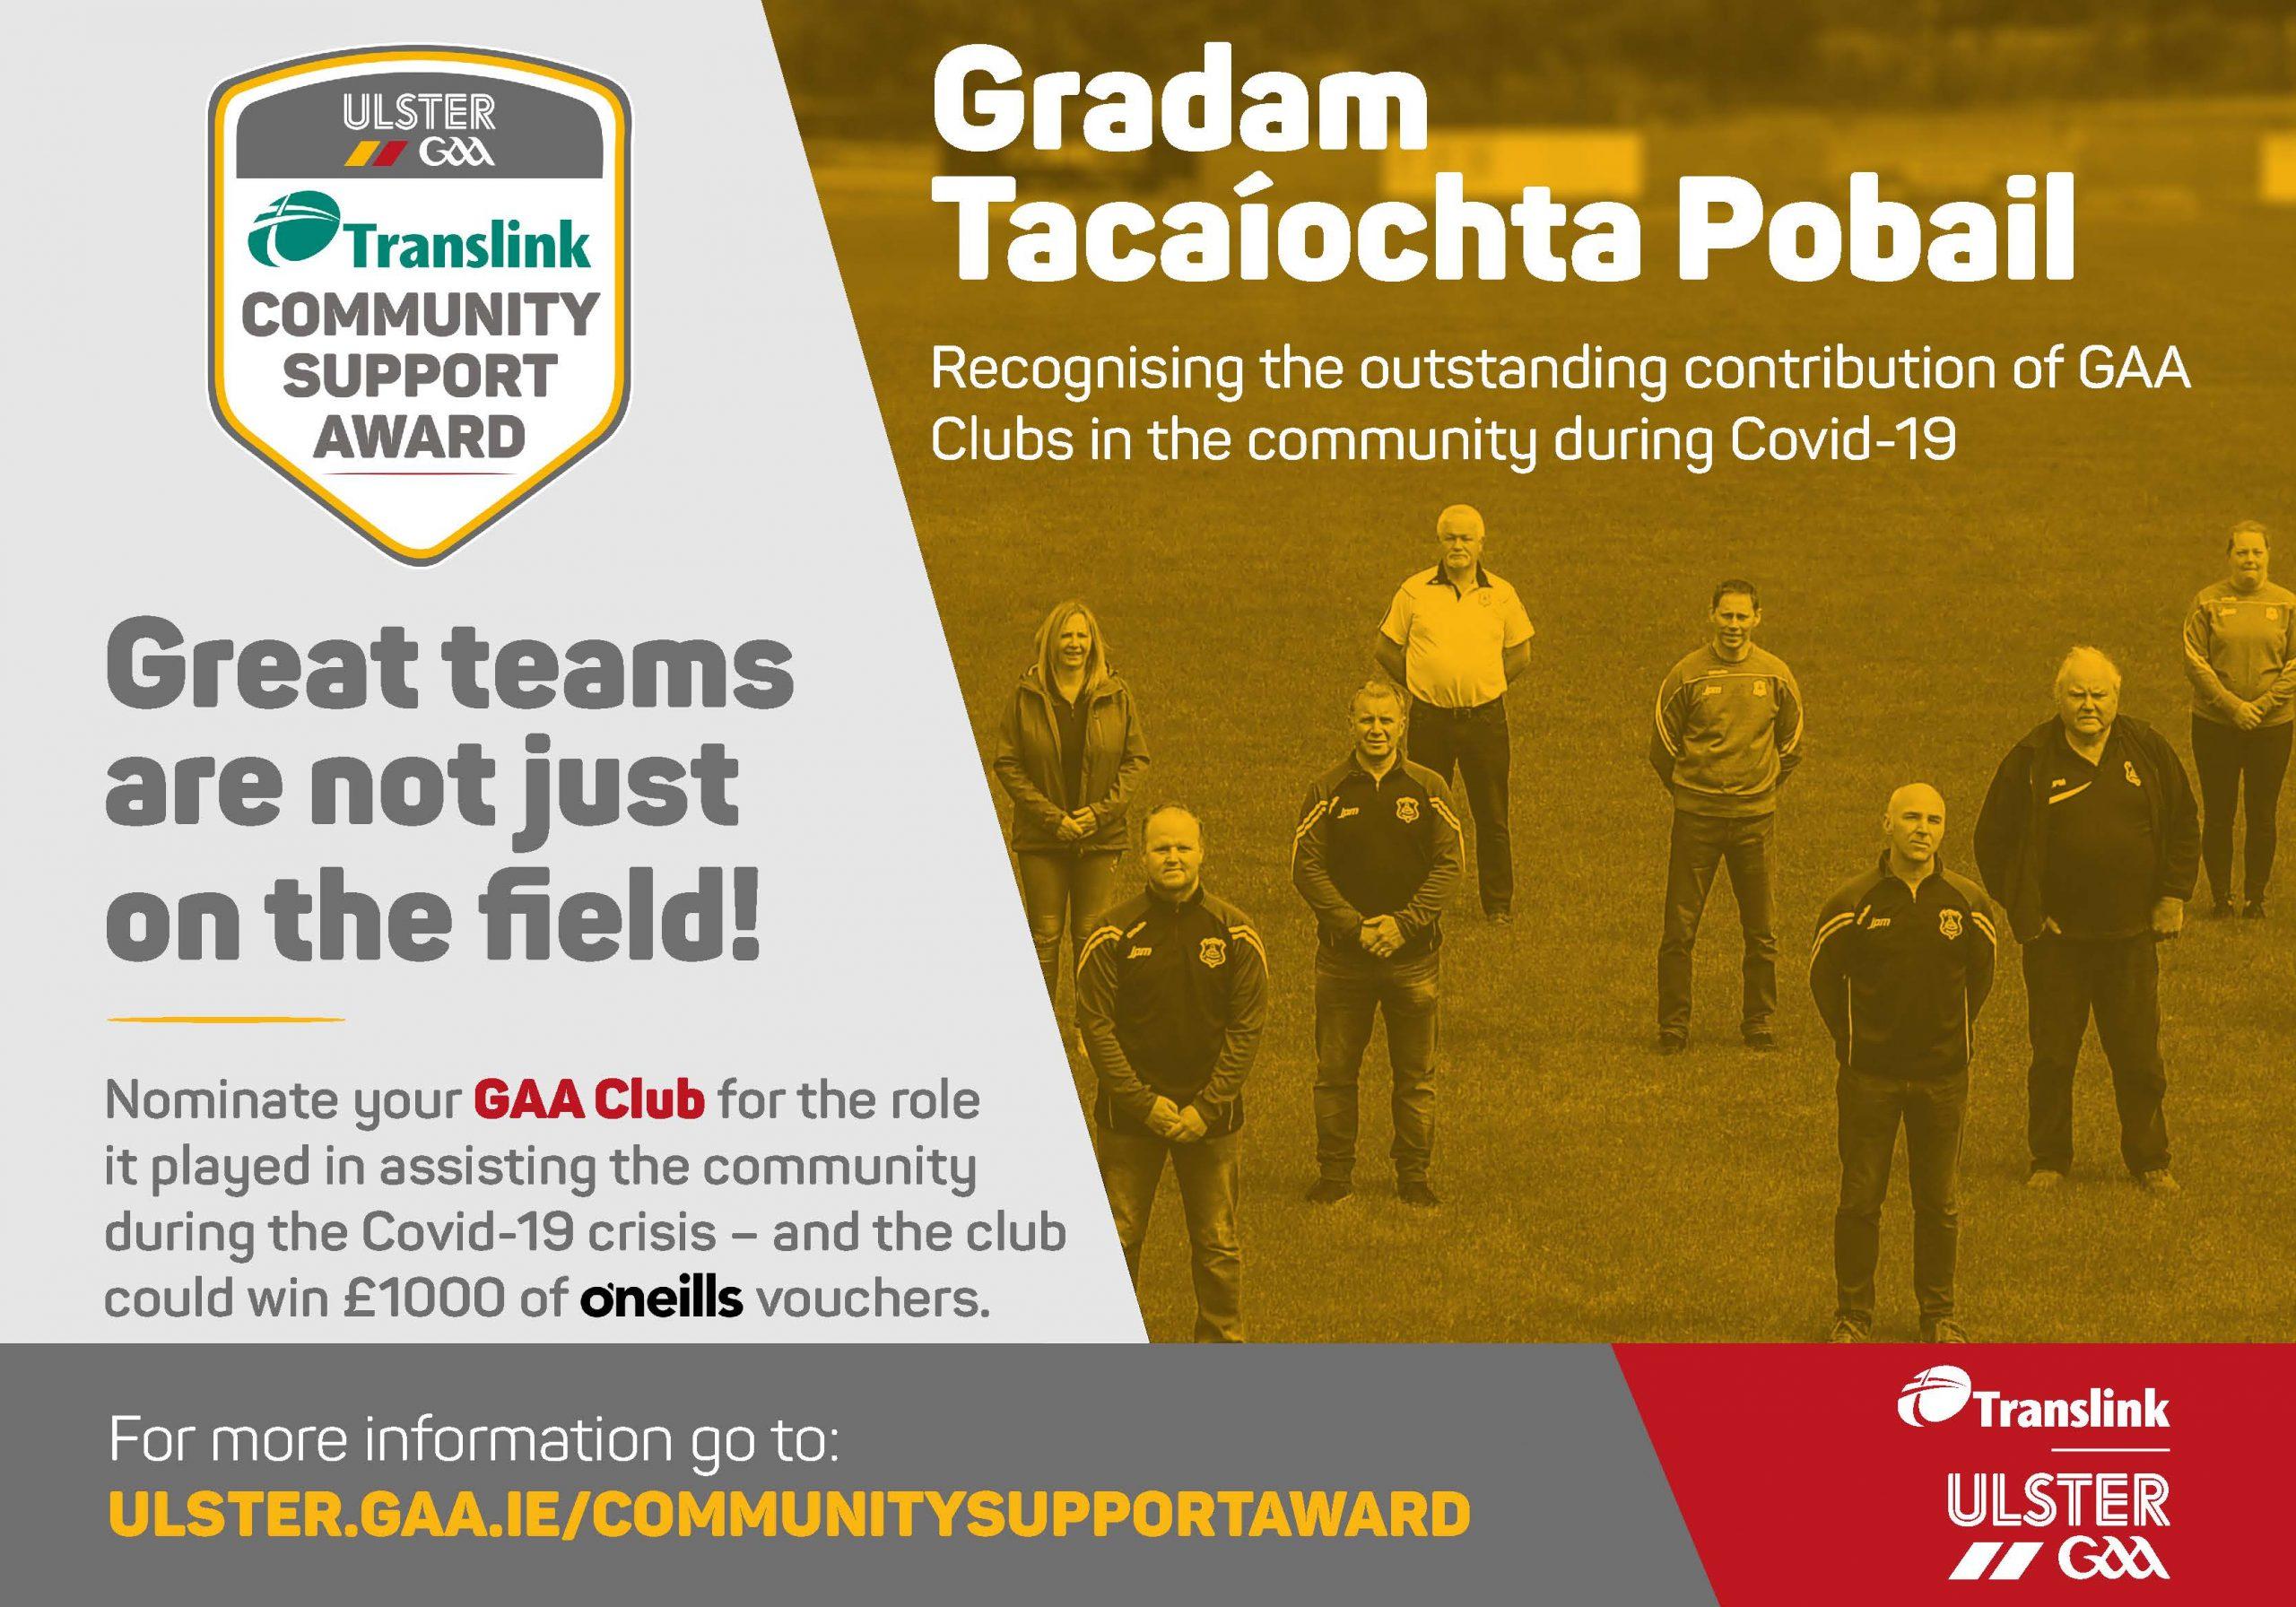 Translink Ulster GAA Community Support Award!